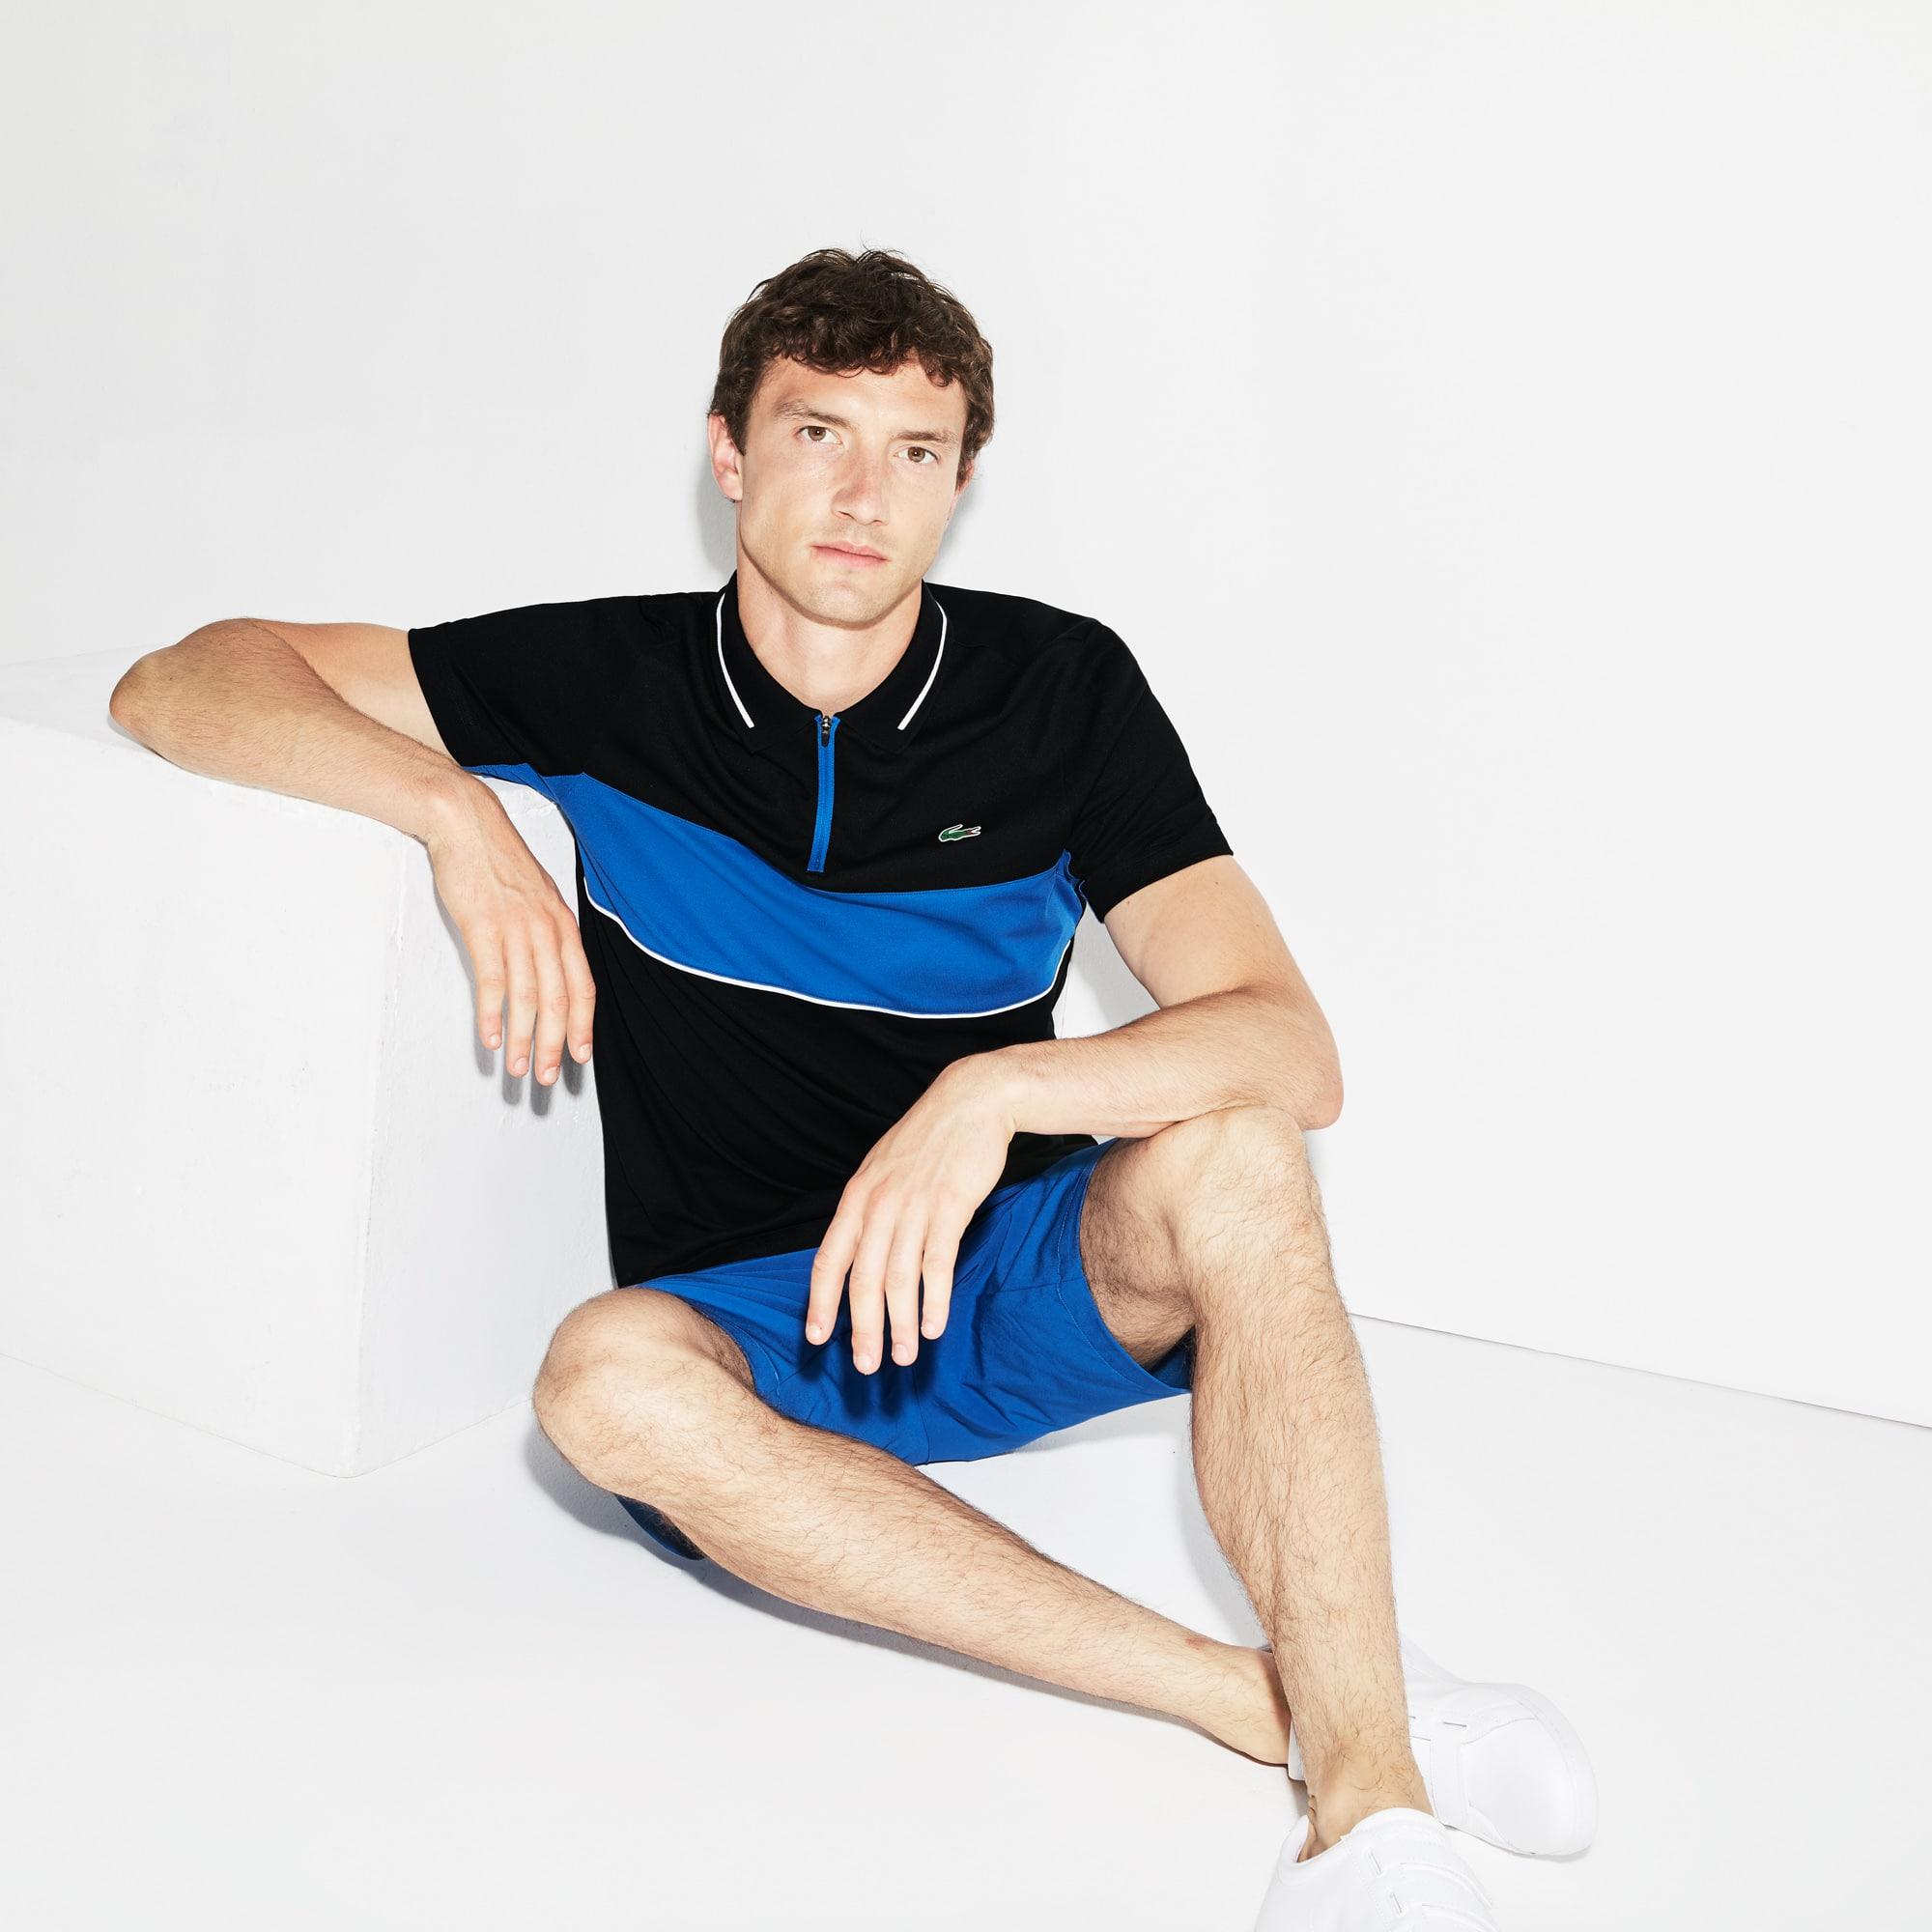 Lacoste - Herren LACOSTE SPORT Tennis-Poloshirt aus Funktionspiqué - 1